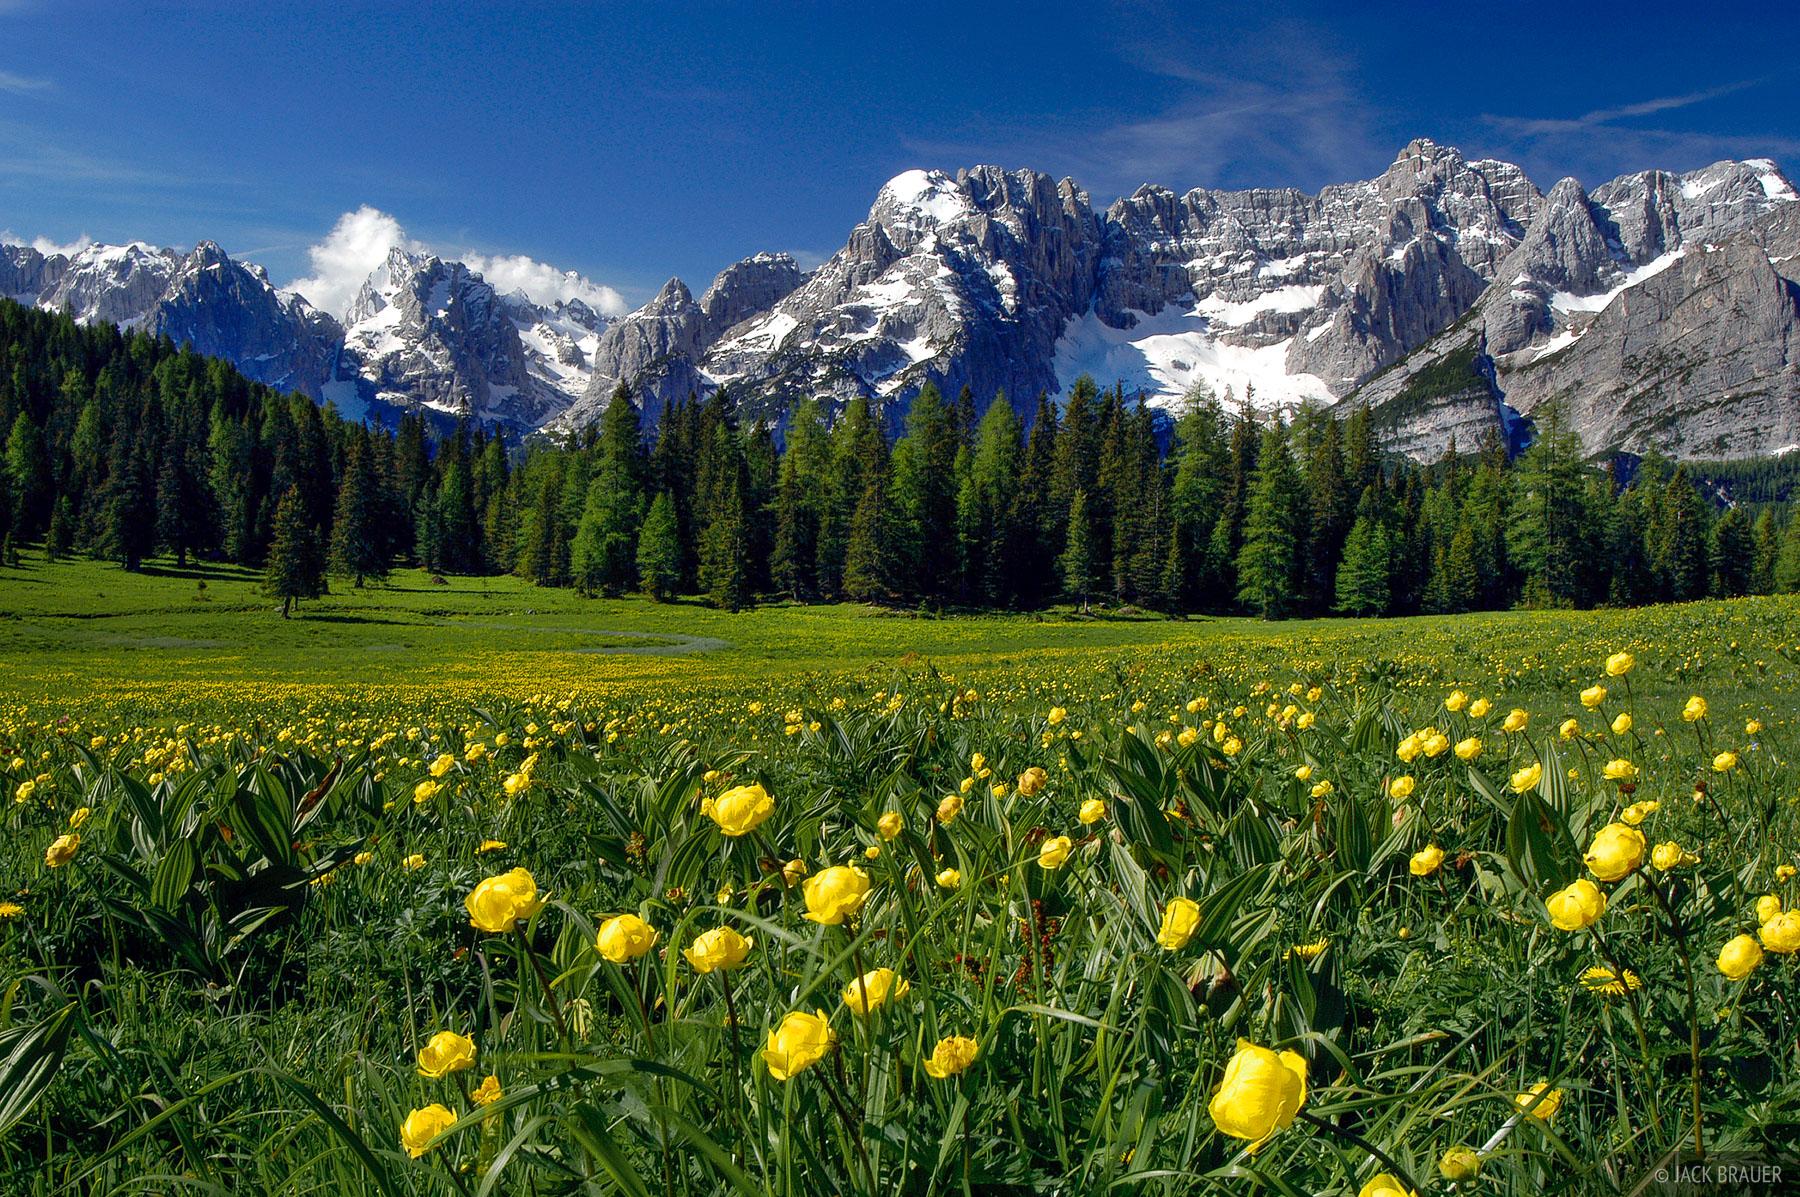 wildflowers, Sorapis, Lago Misurina, Dolomites, Italy, photo